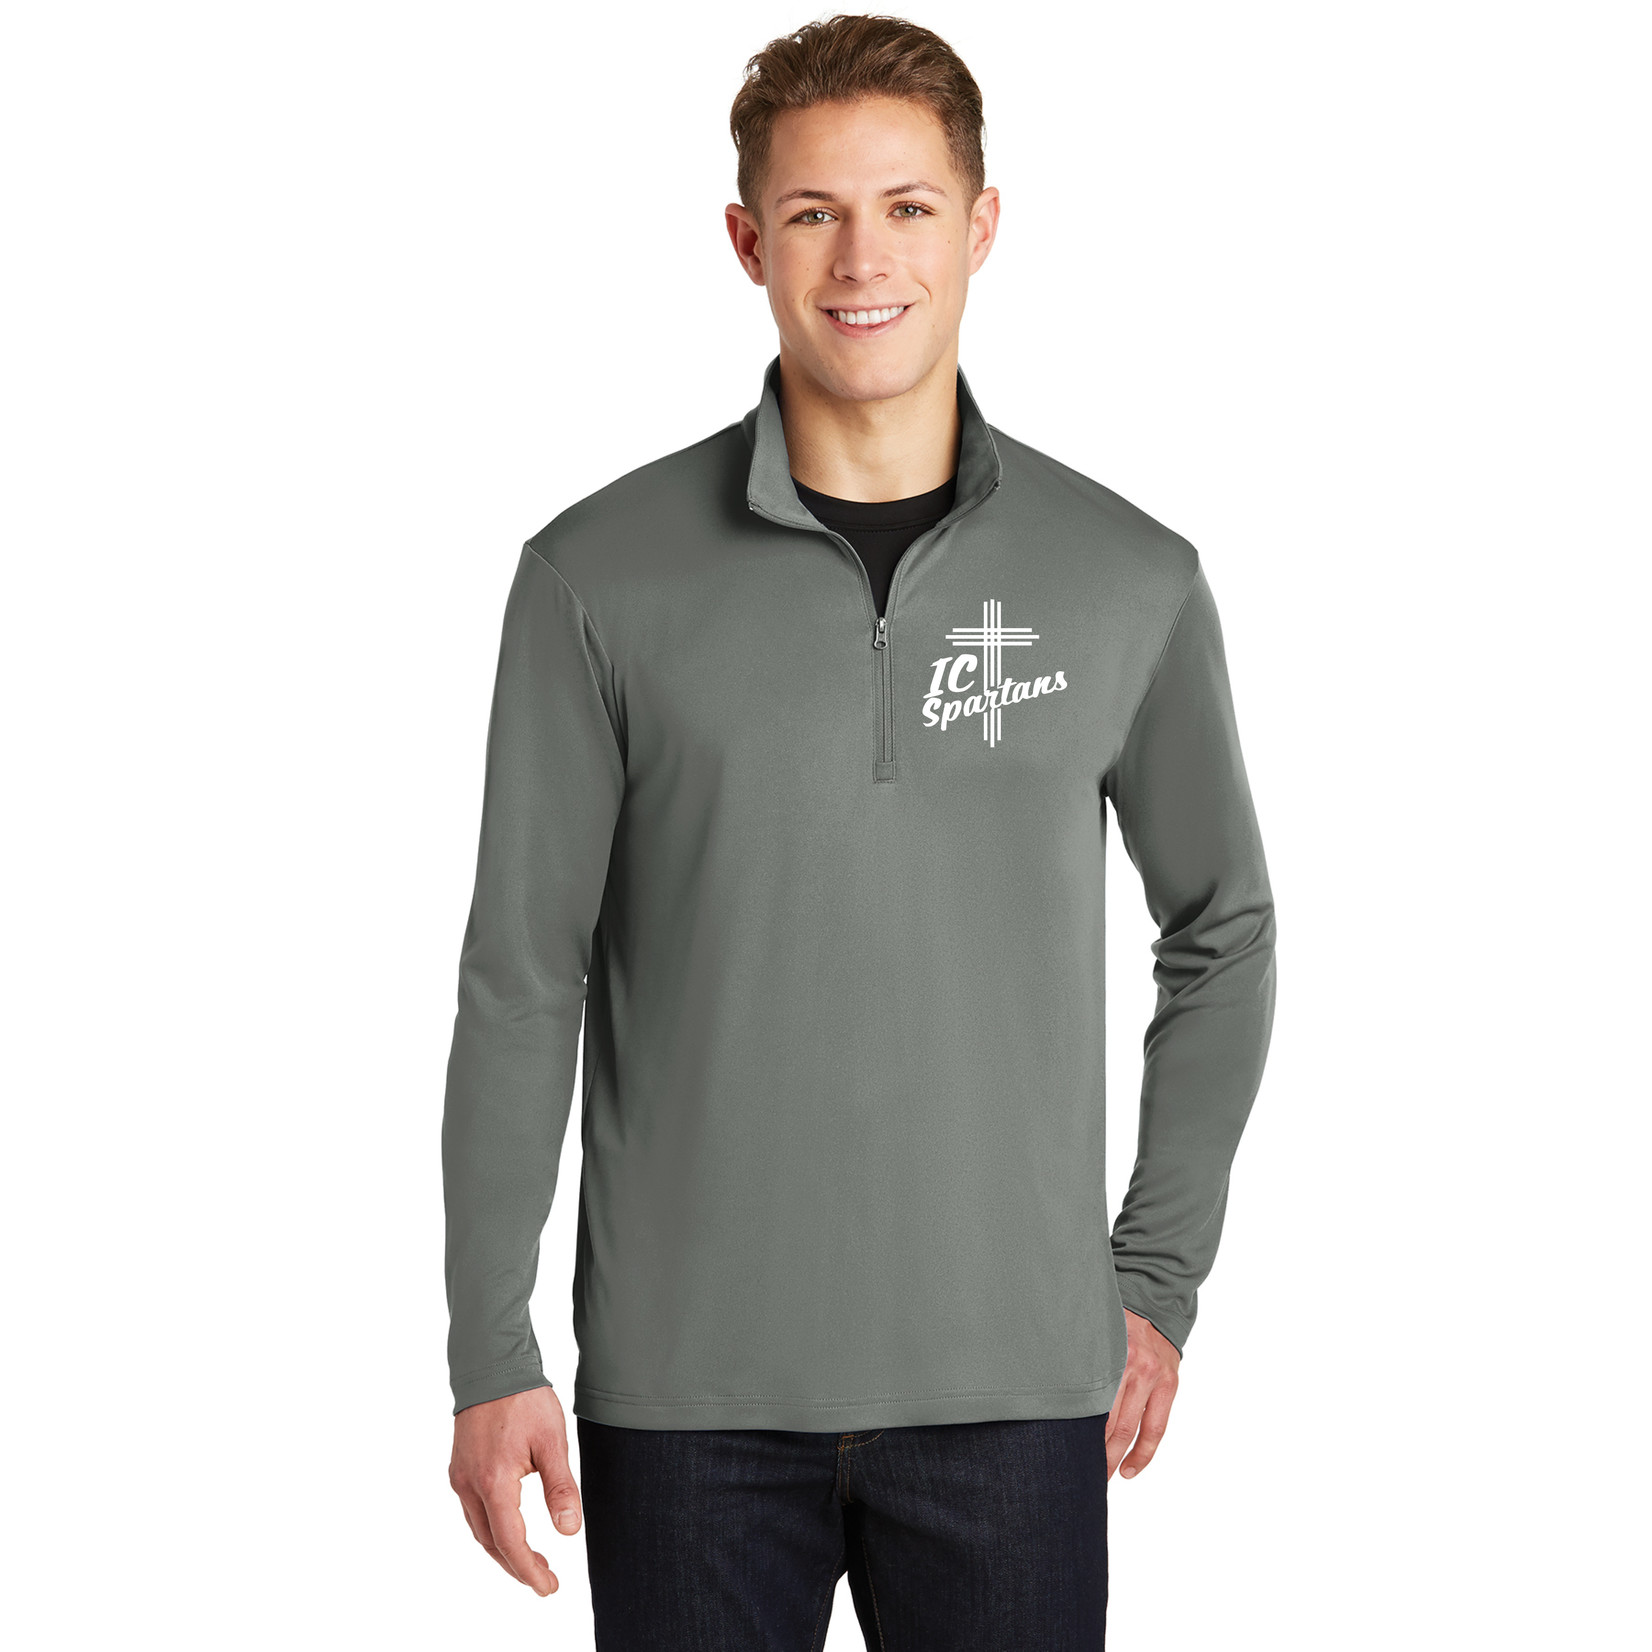 Sport-Tek Adult Lightweight 1/4 Zip Pullover